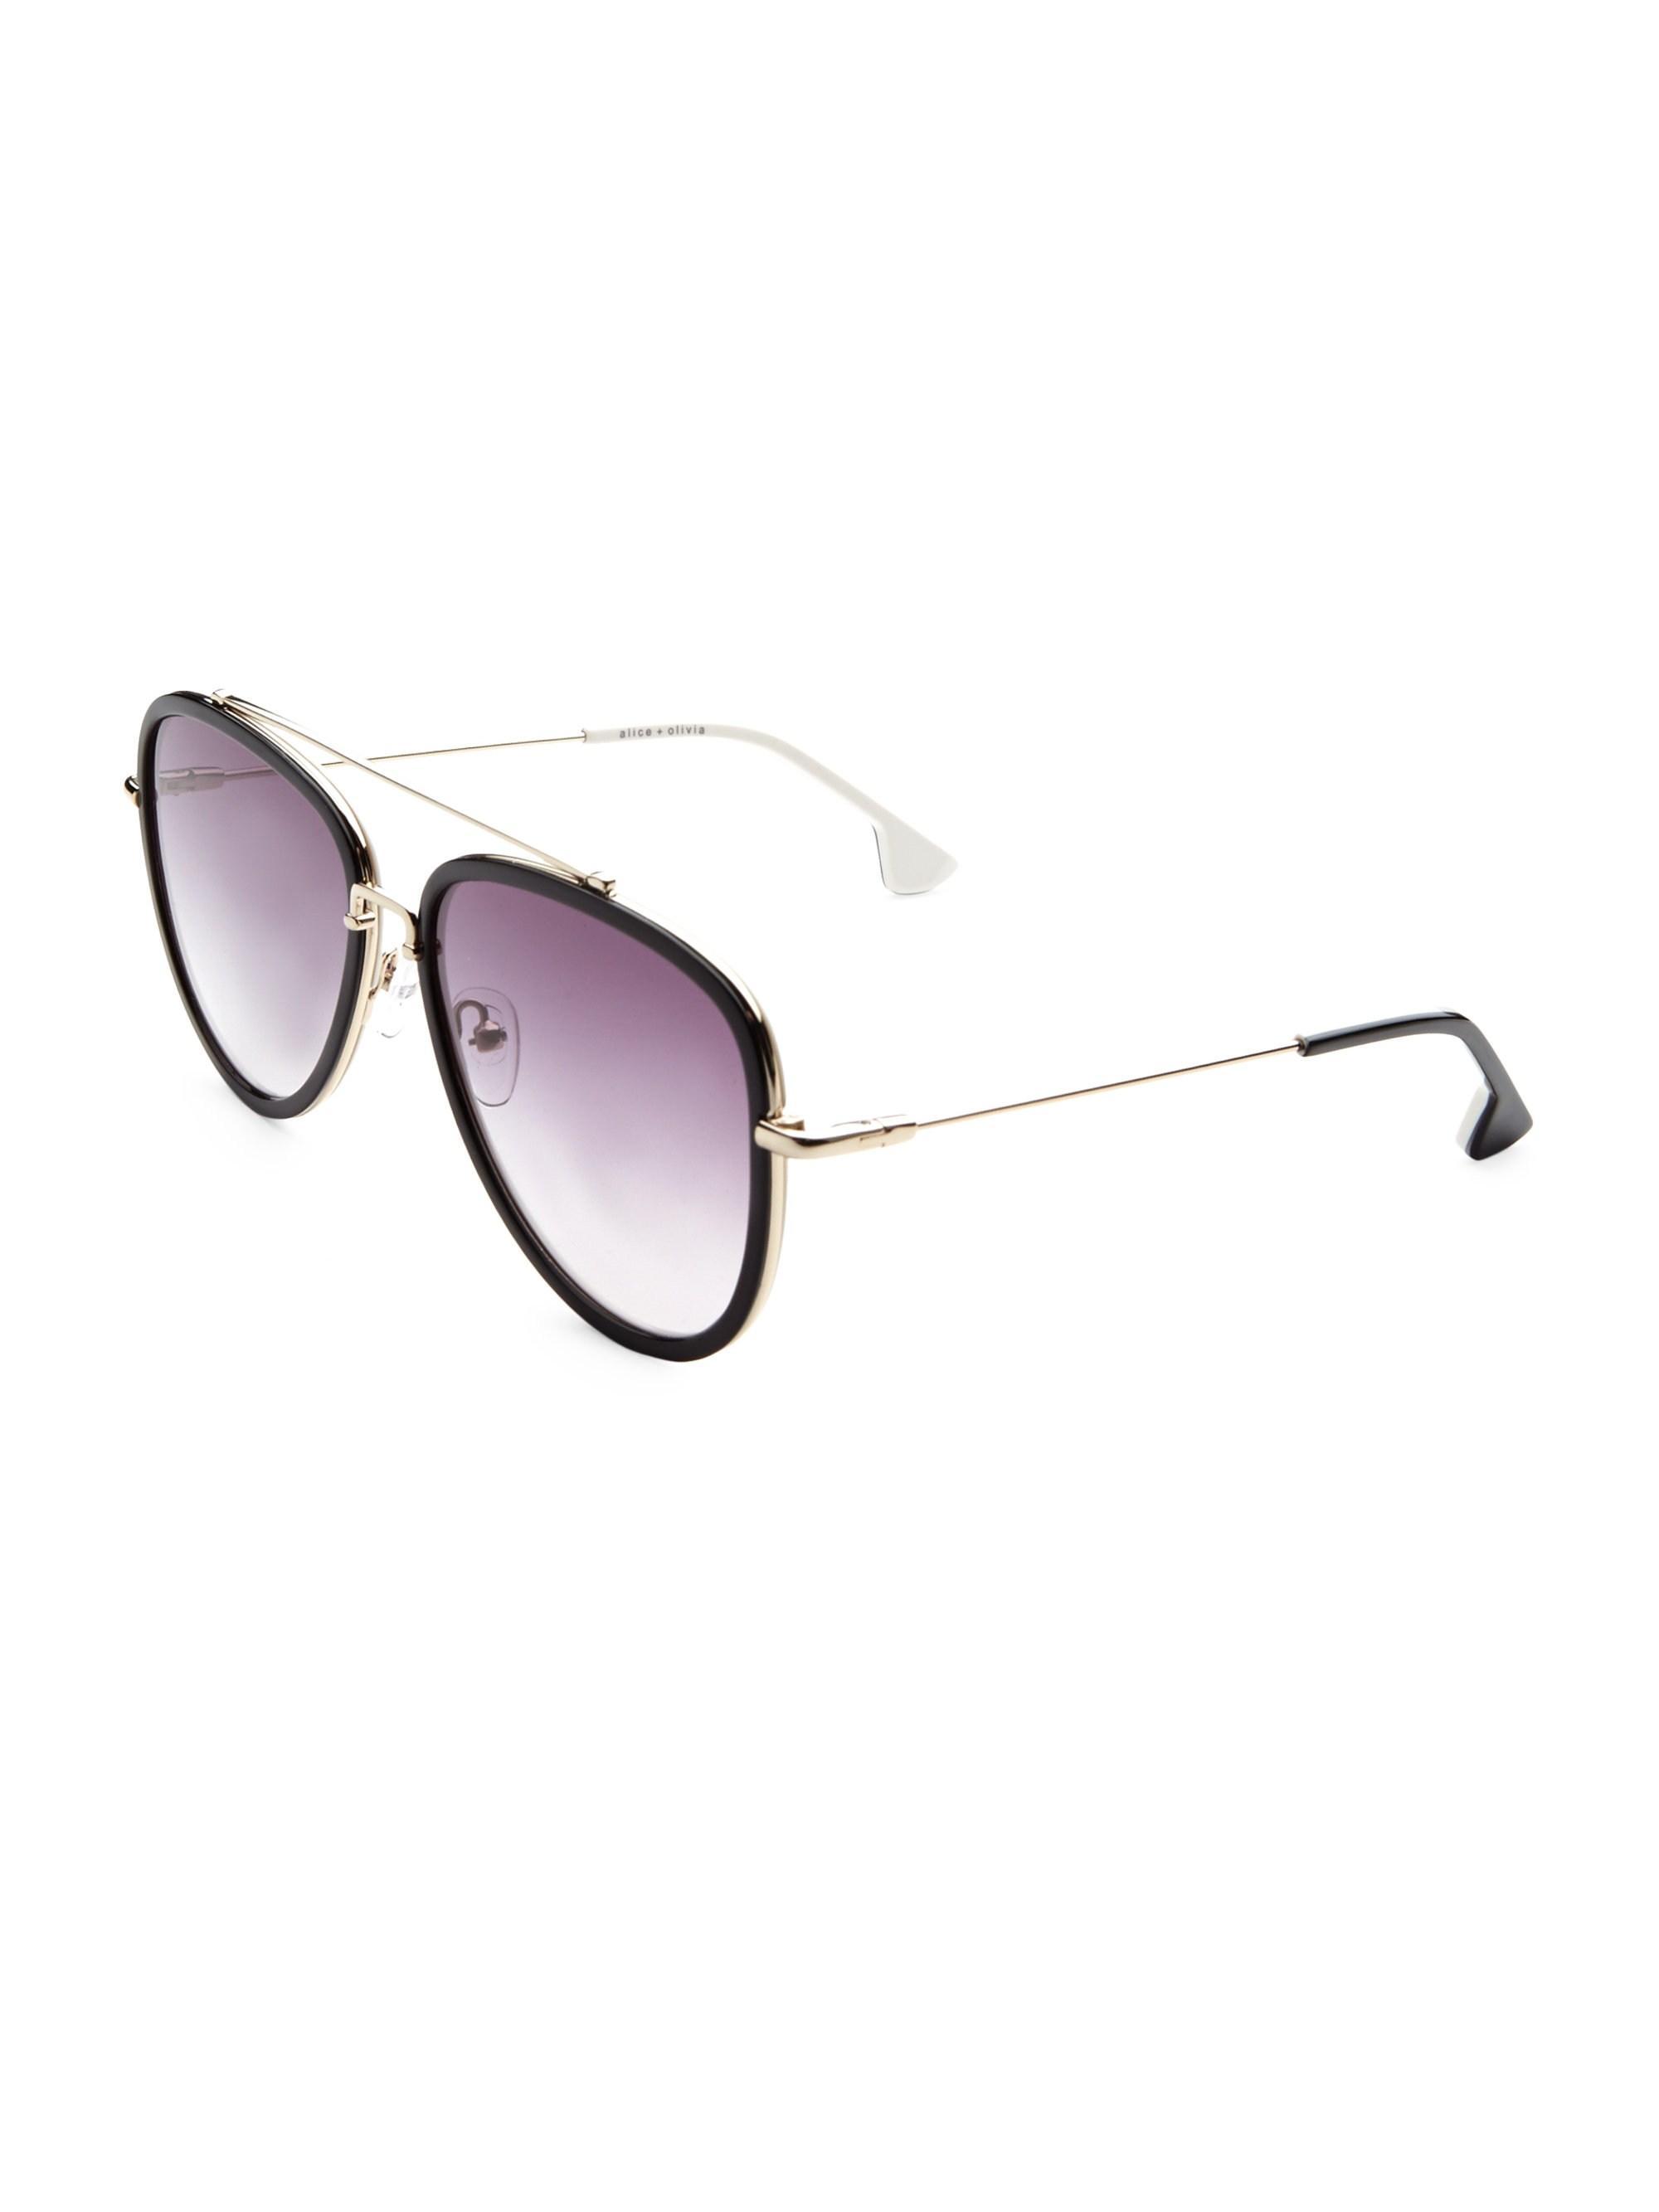 7662bd9928 Alice + Olivia Lincoln Black Aviator Sunglasses in Black - Lyst